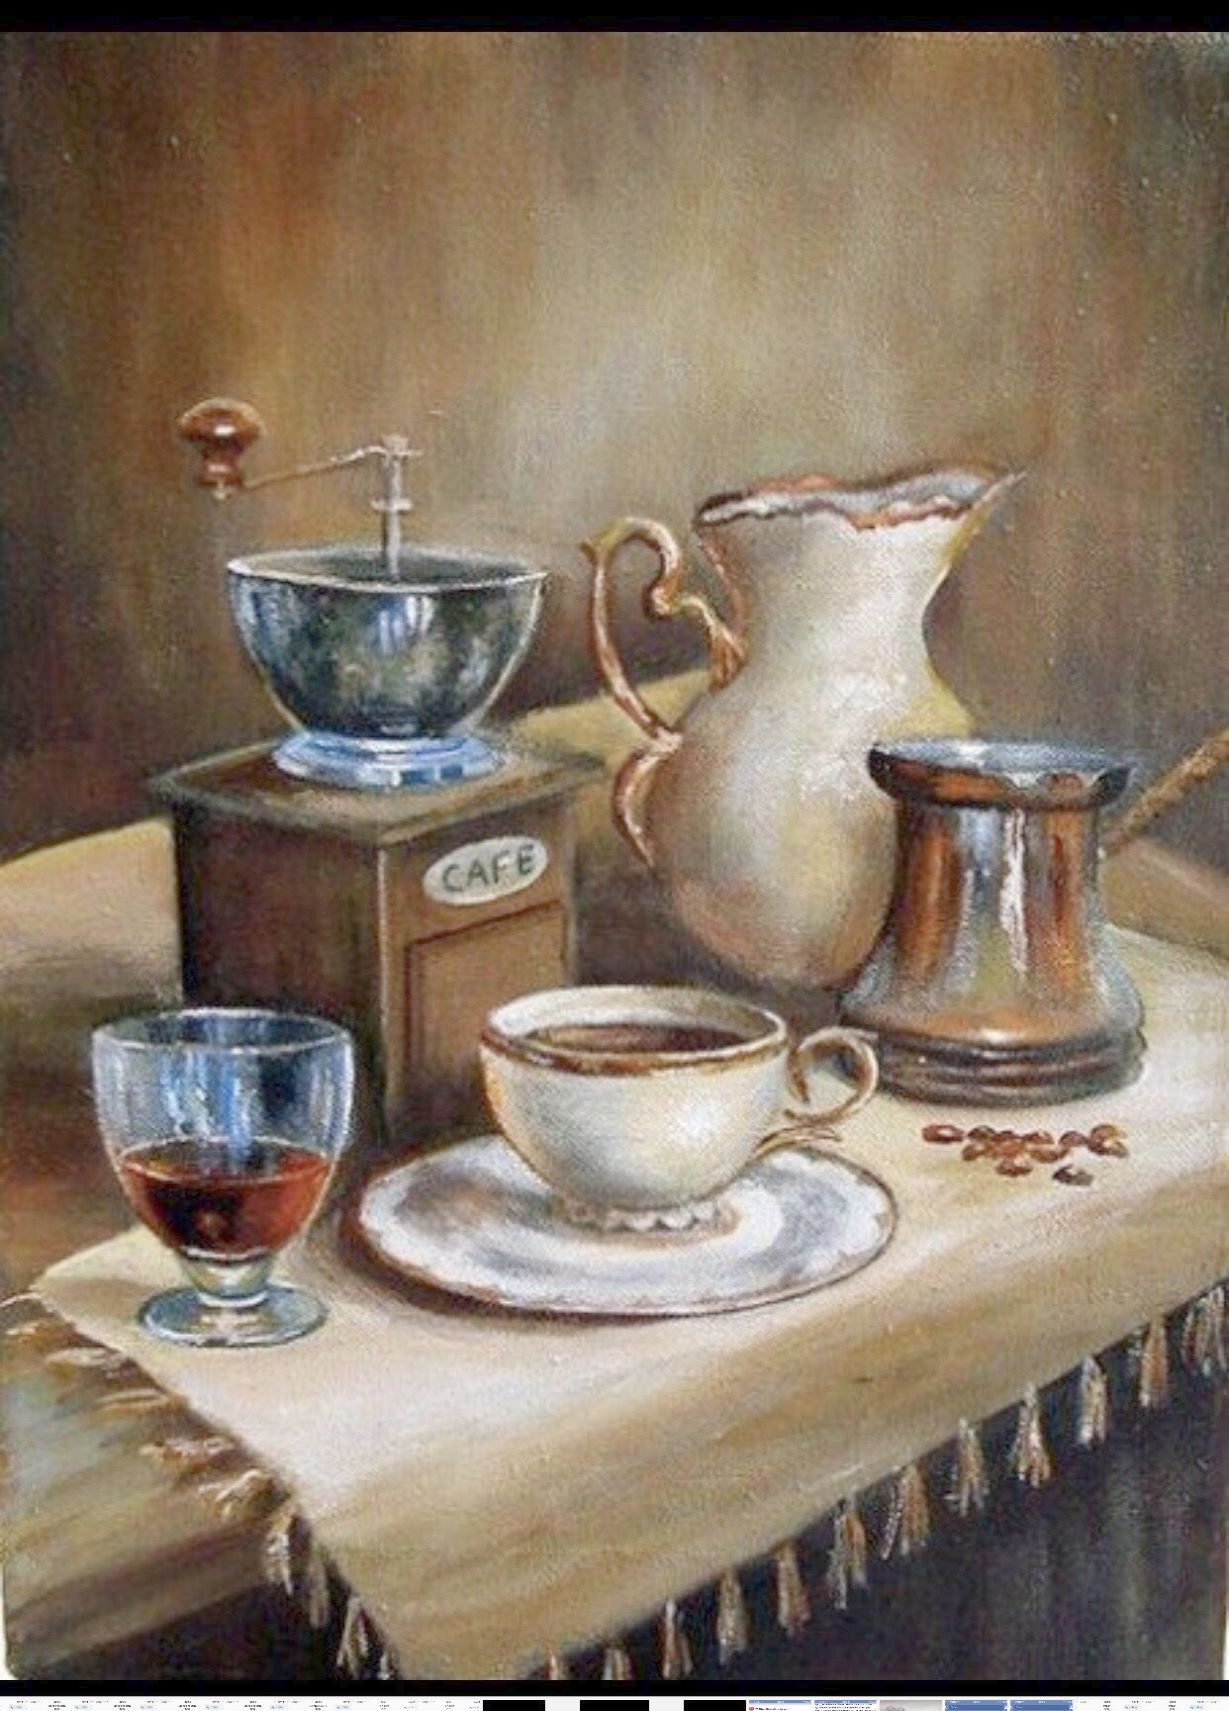 Coffee Maker Lowes, Coffee Near Me Menu, Coffee Jobs Near